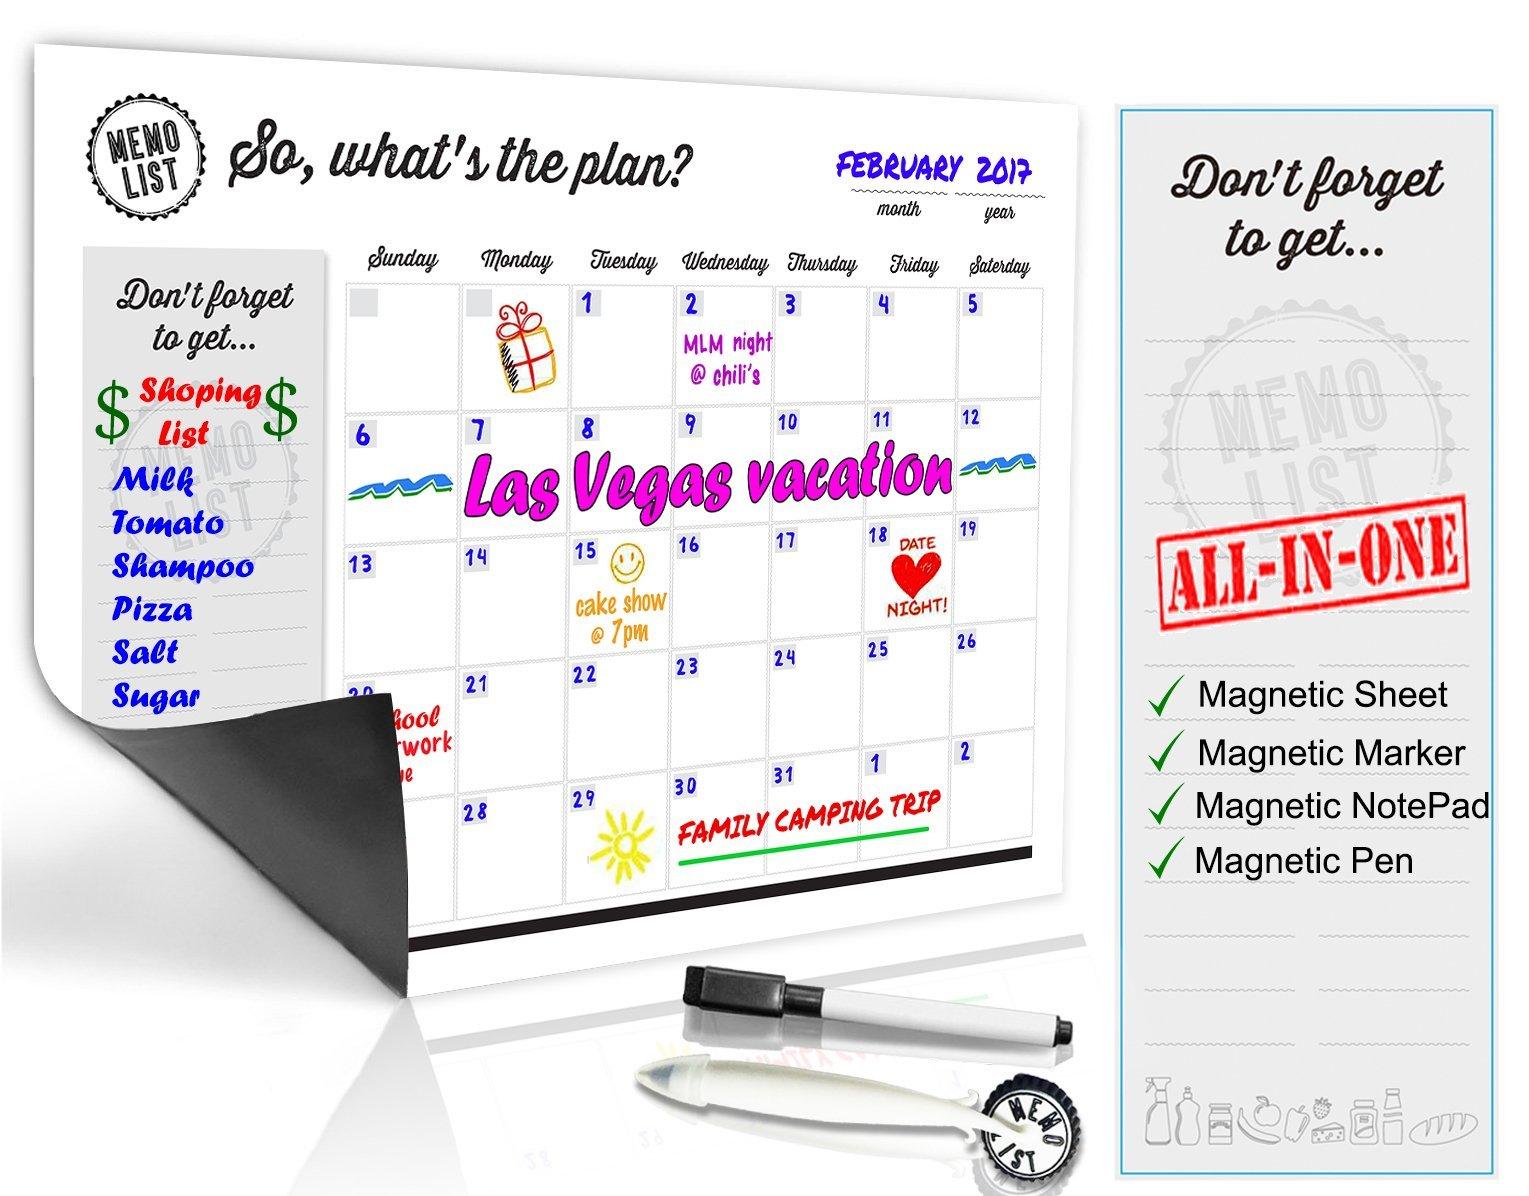 Refrigerator Calendar Kit – Includes Magnet Board/Magnetic Notepad/Magnetic Dry Erase Marker + Eraser Top/Design Magnetic Pen – Easily Write & Wipe (White)